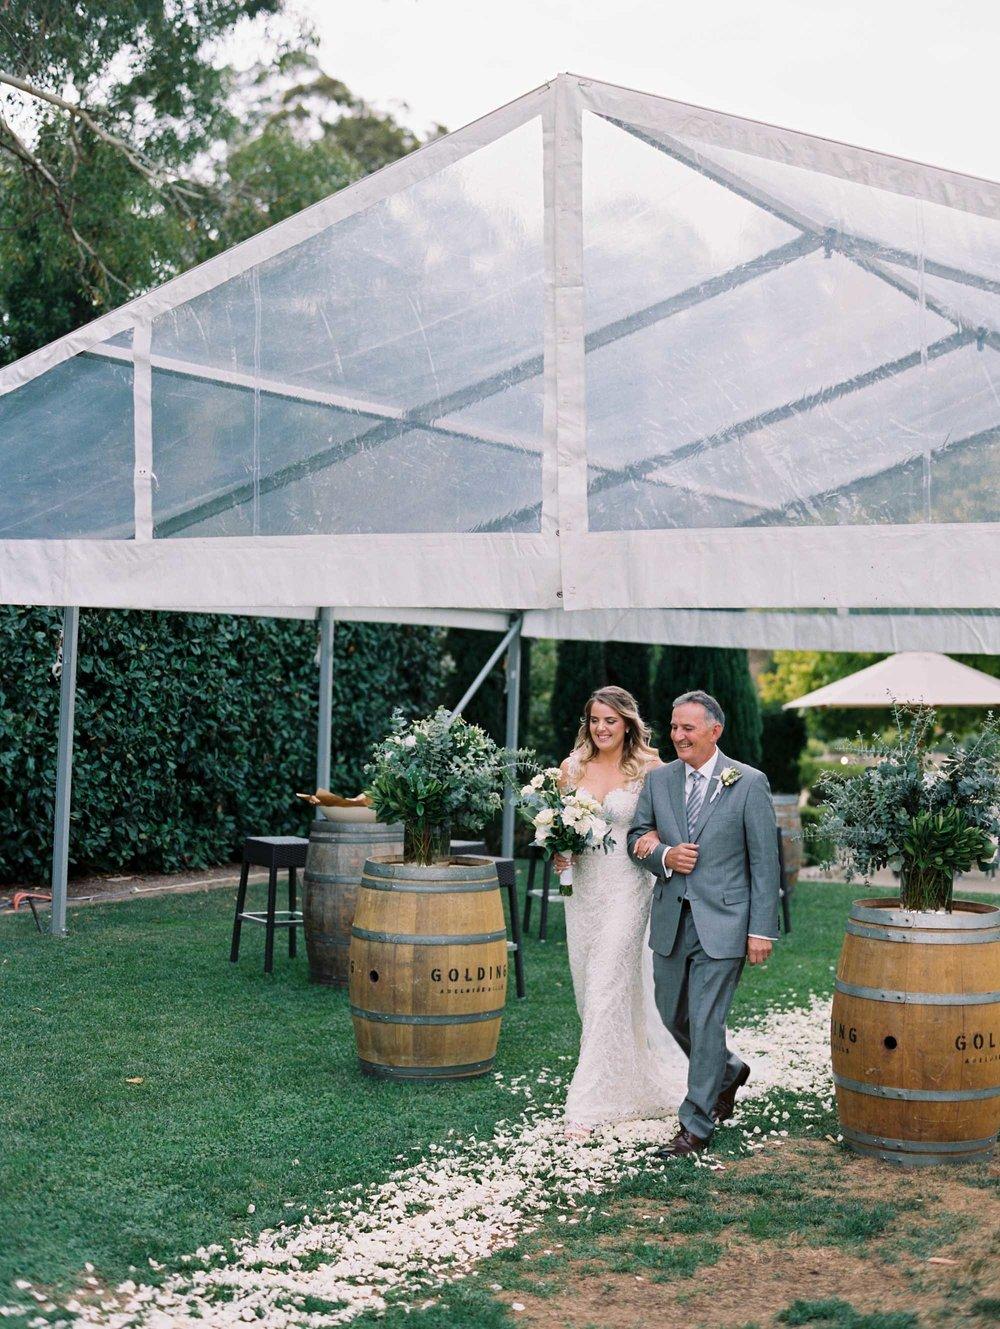 Golding-Wines-wedding-photography-049.jpg